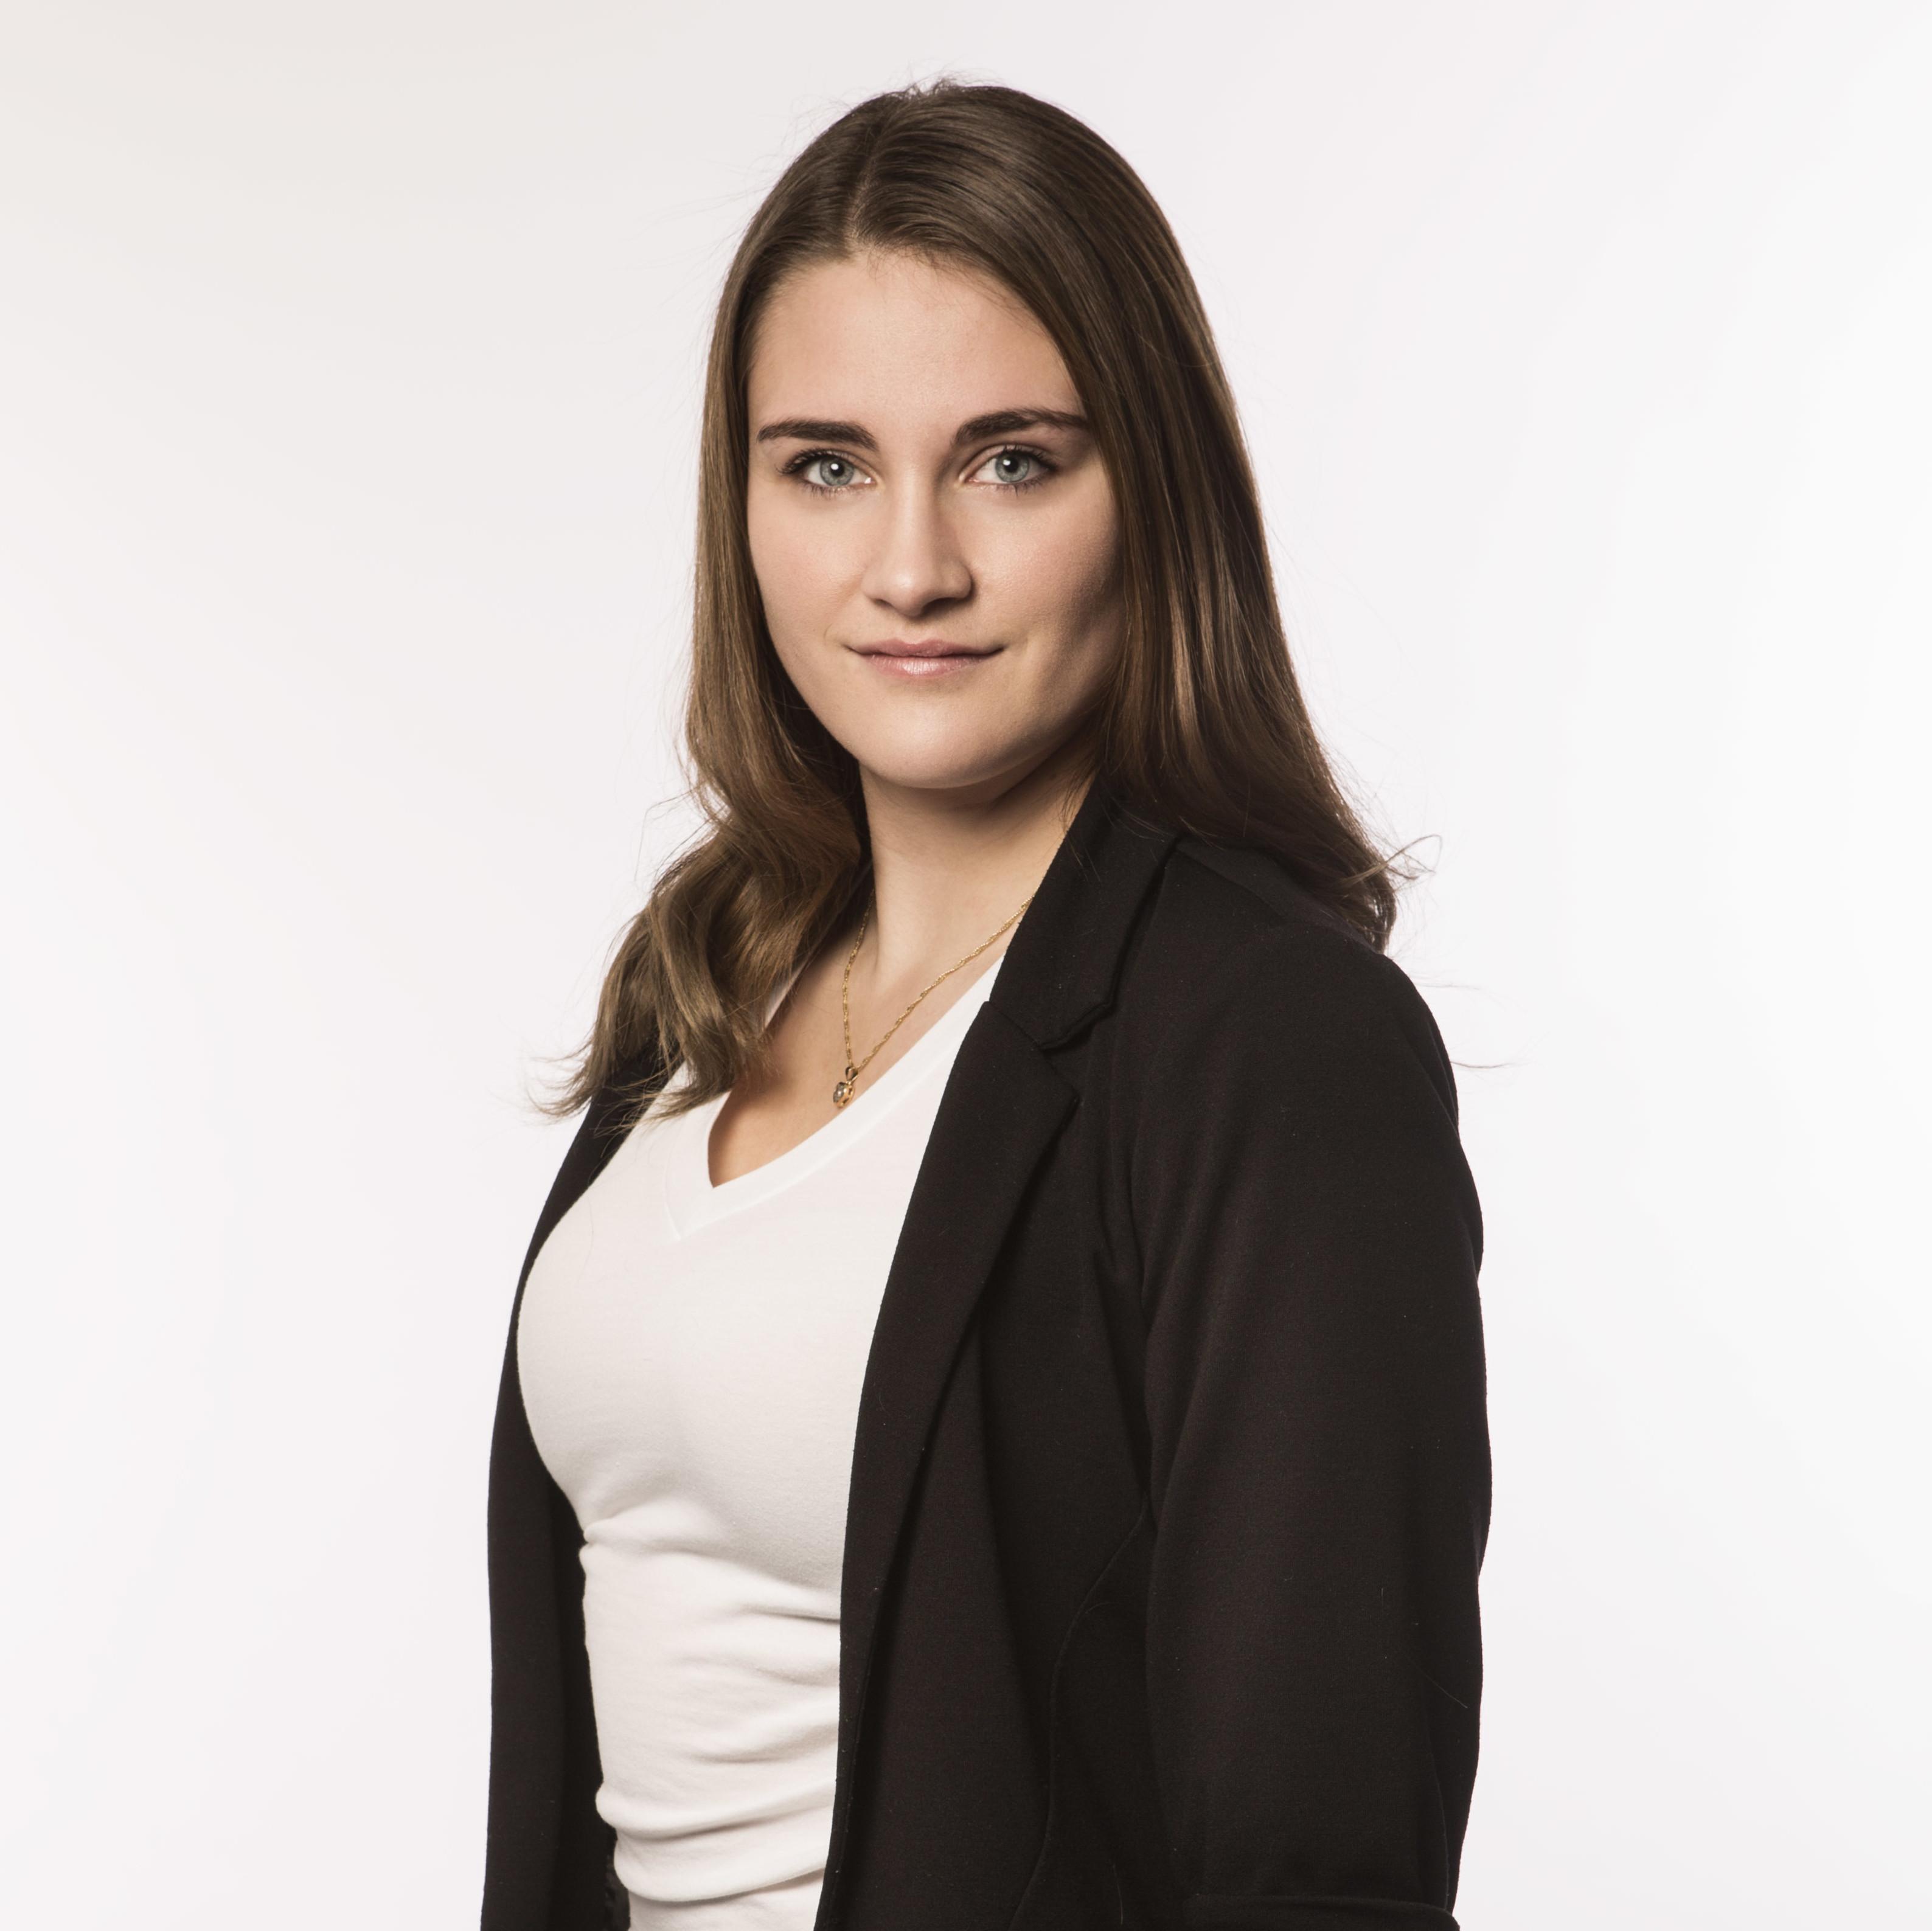 Tania Clouston